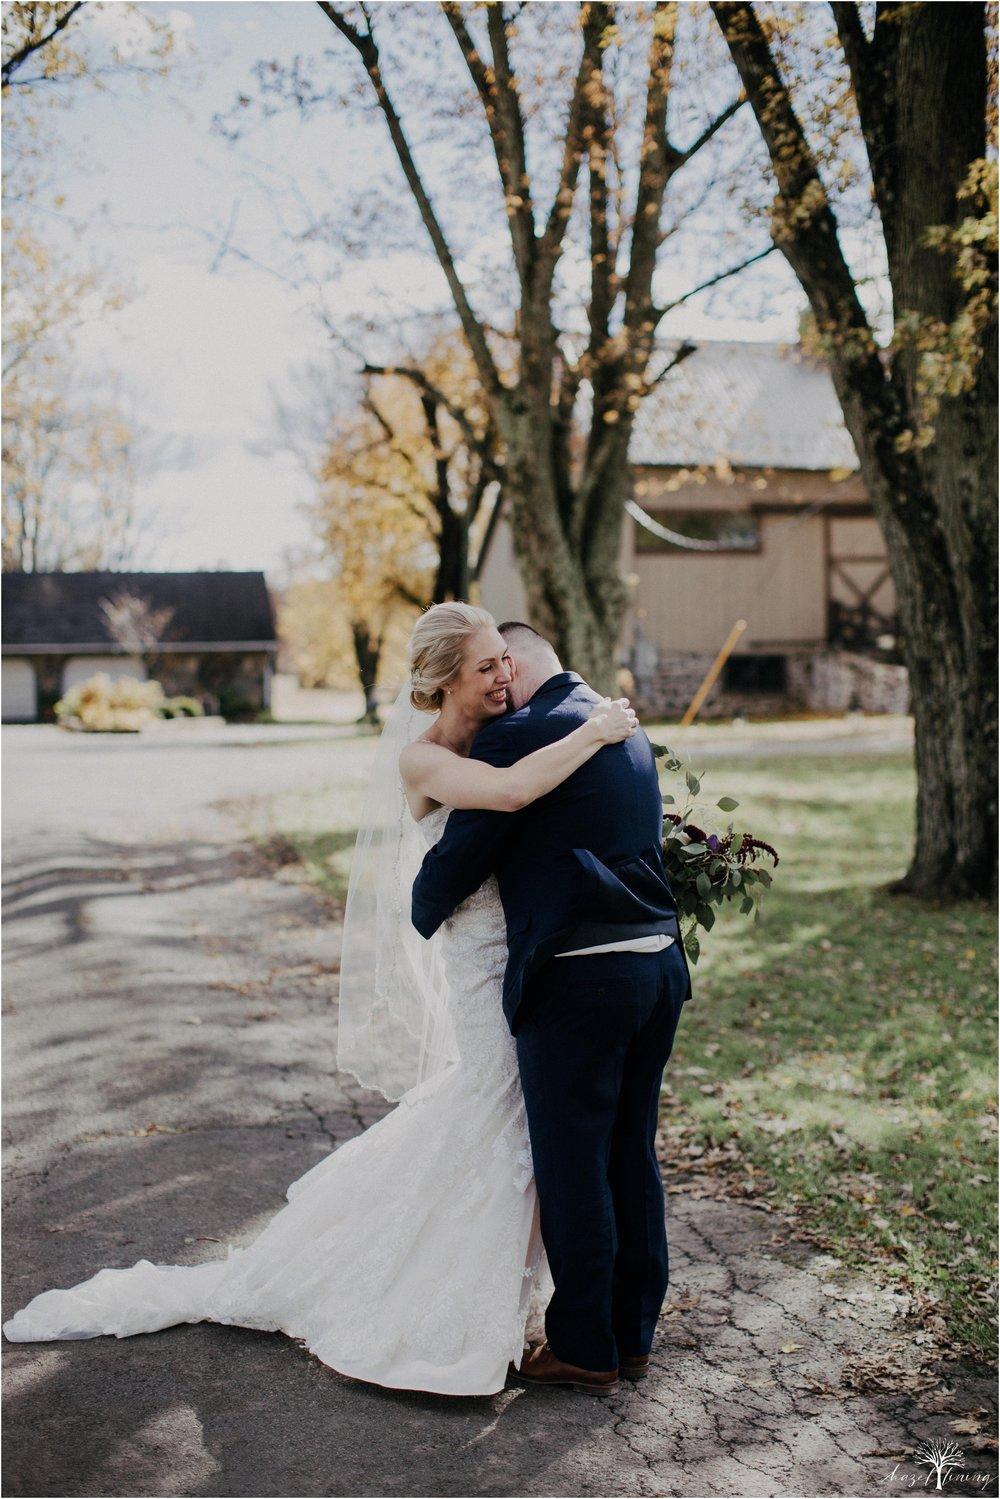 briana-krans-greg-johnston-farm-bakery-and-events-fall-wedding_0025.jpg